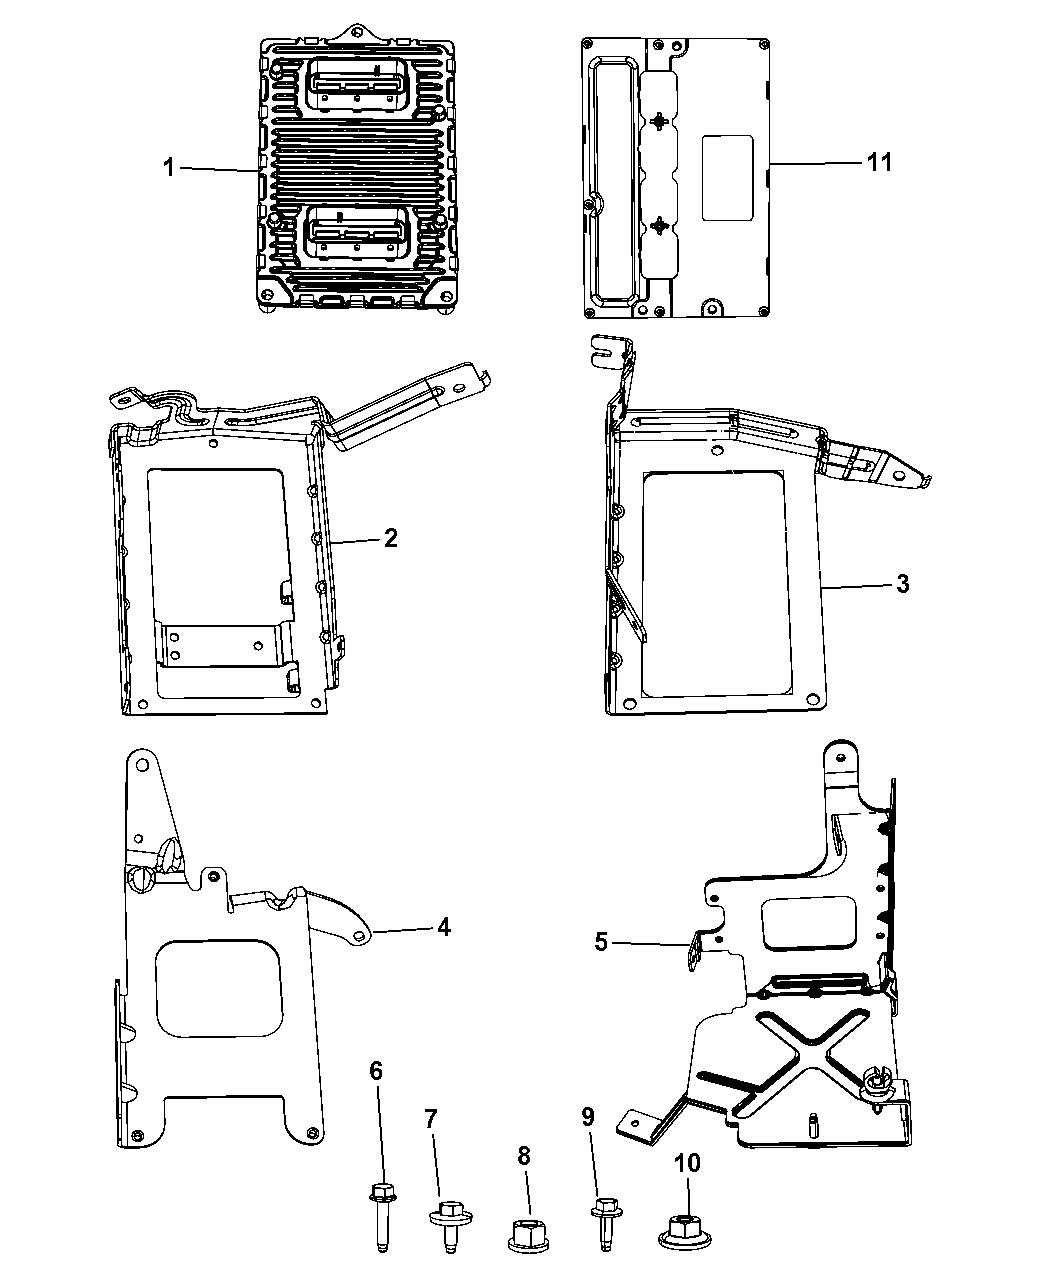 DOWNLOAD Ford Powertrain Control Module Diagram Html Full